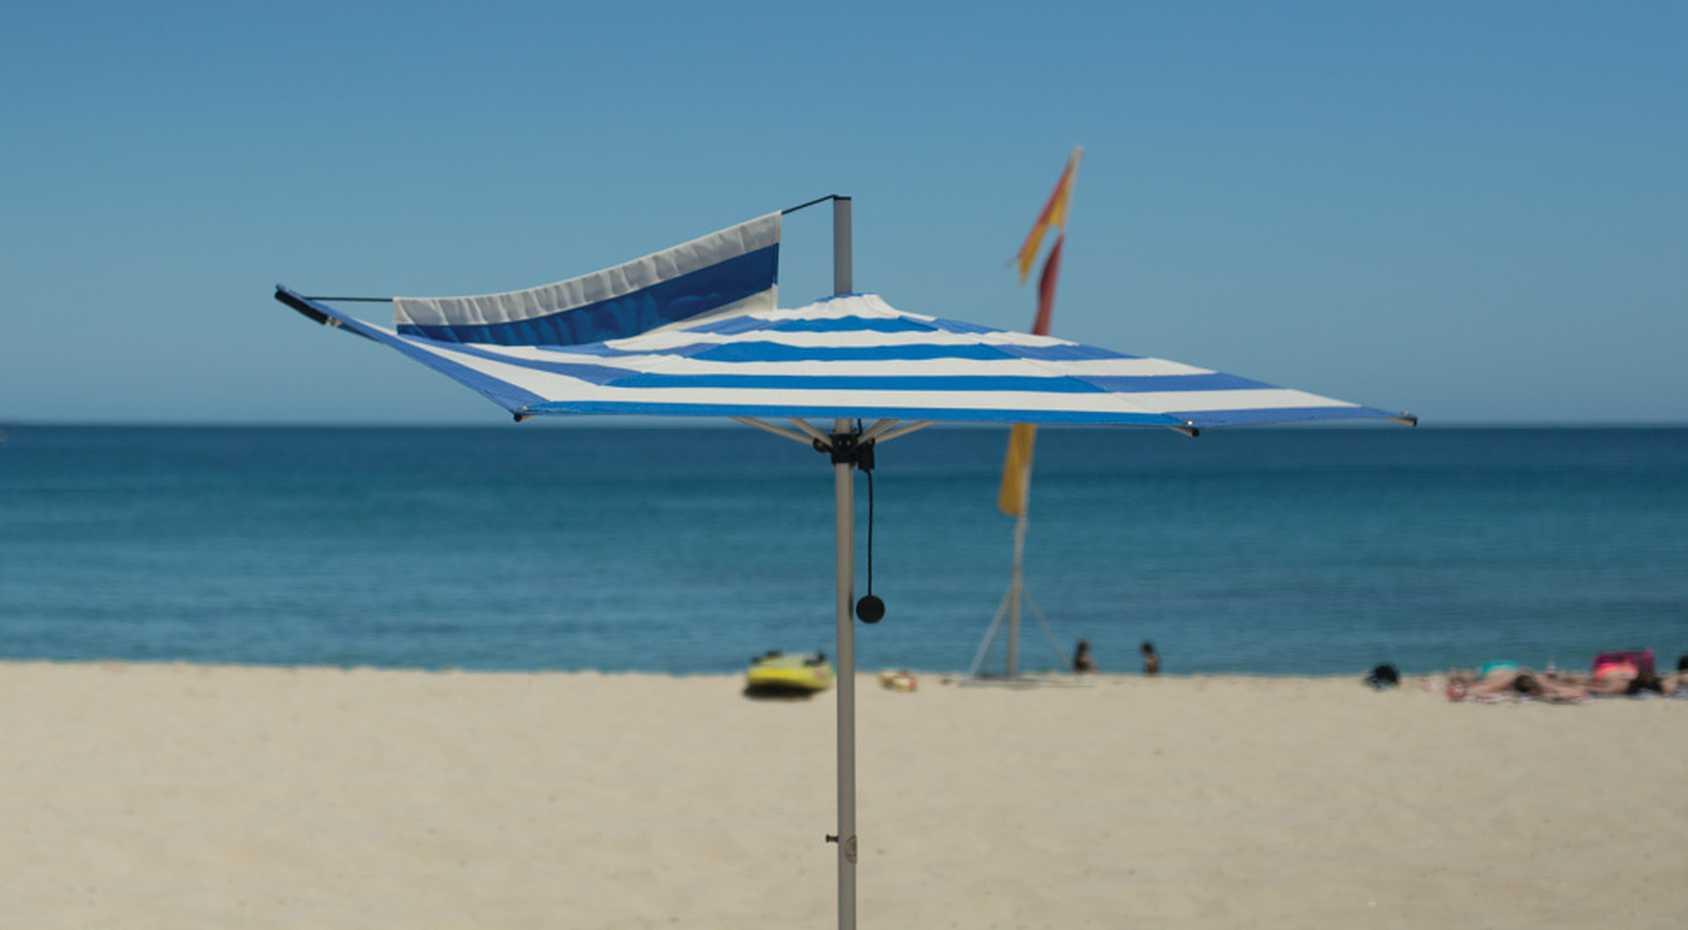 Finbrella by Finbrella product image 7